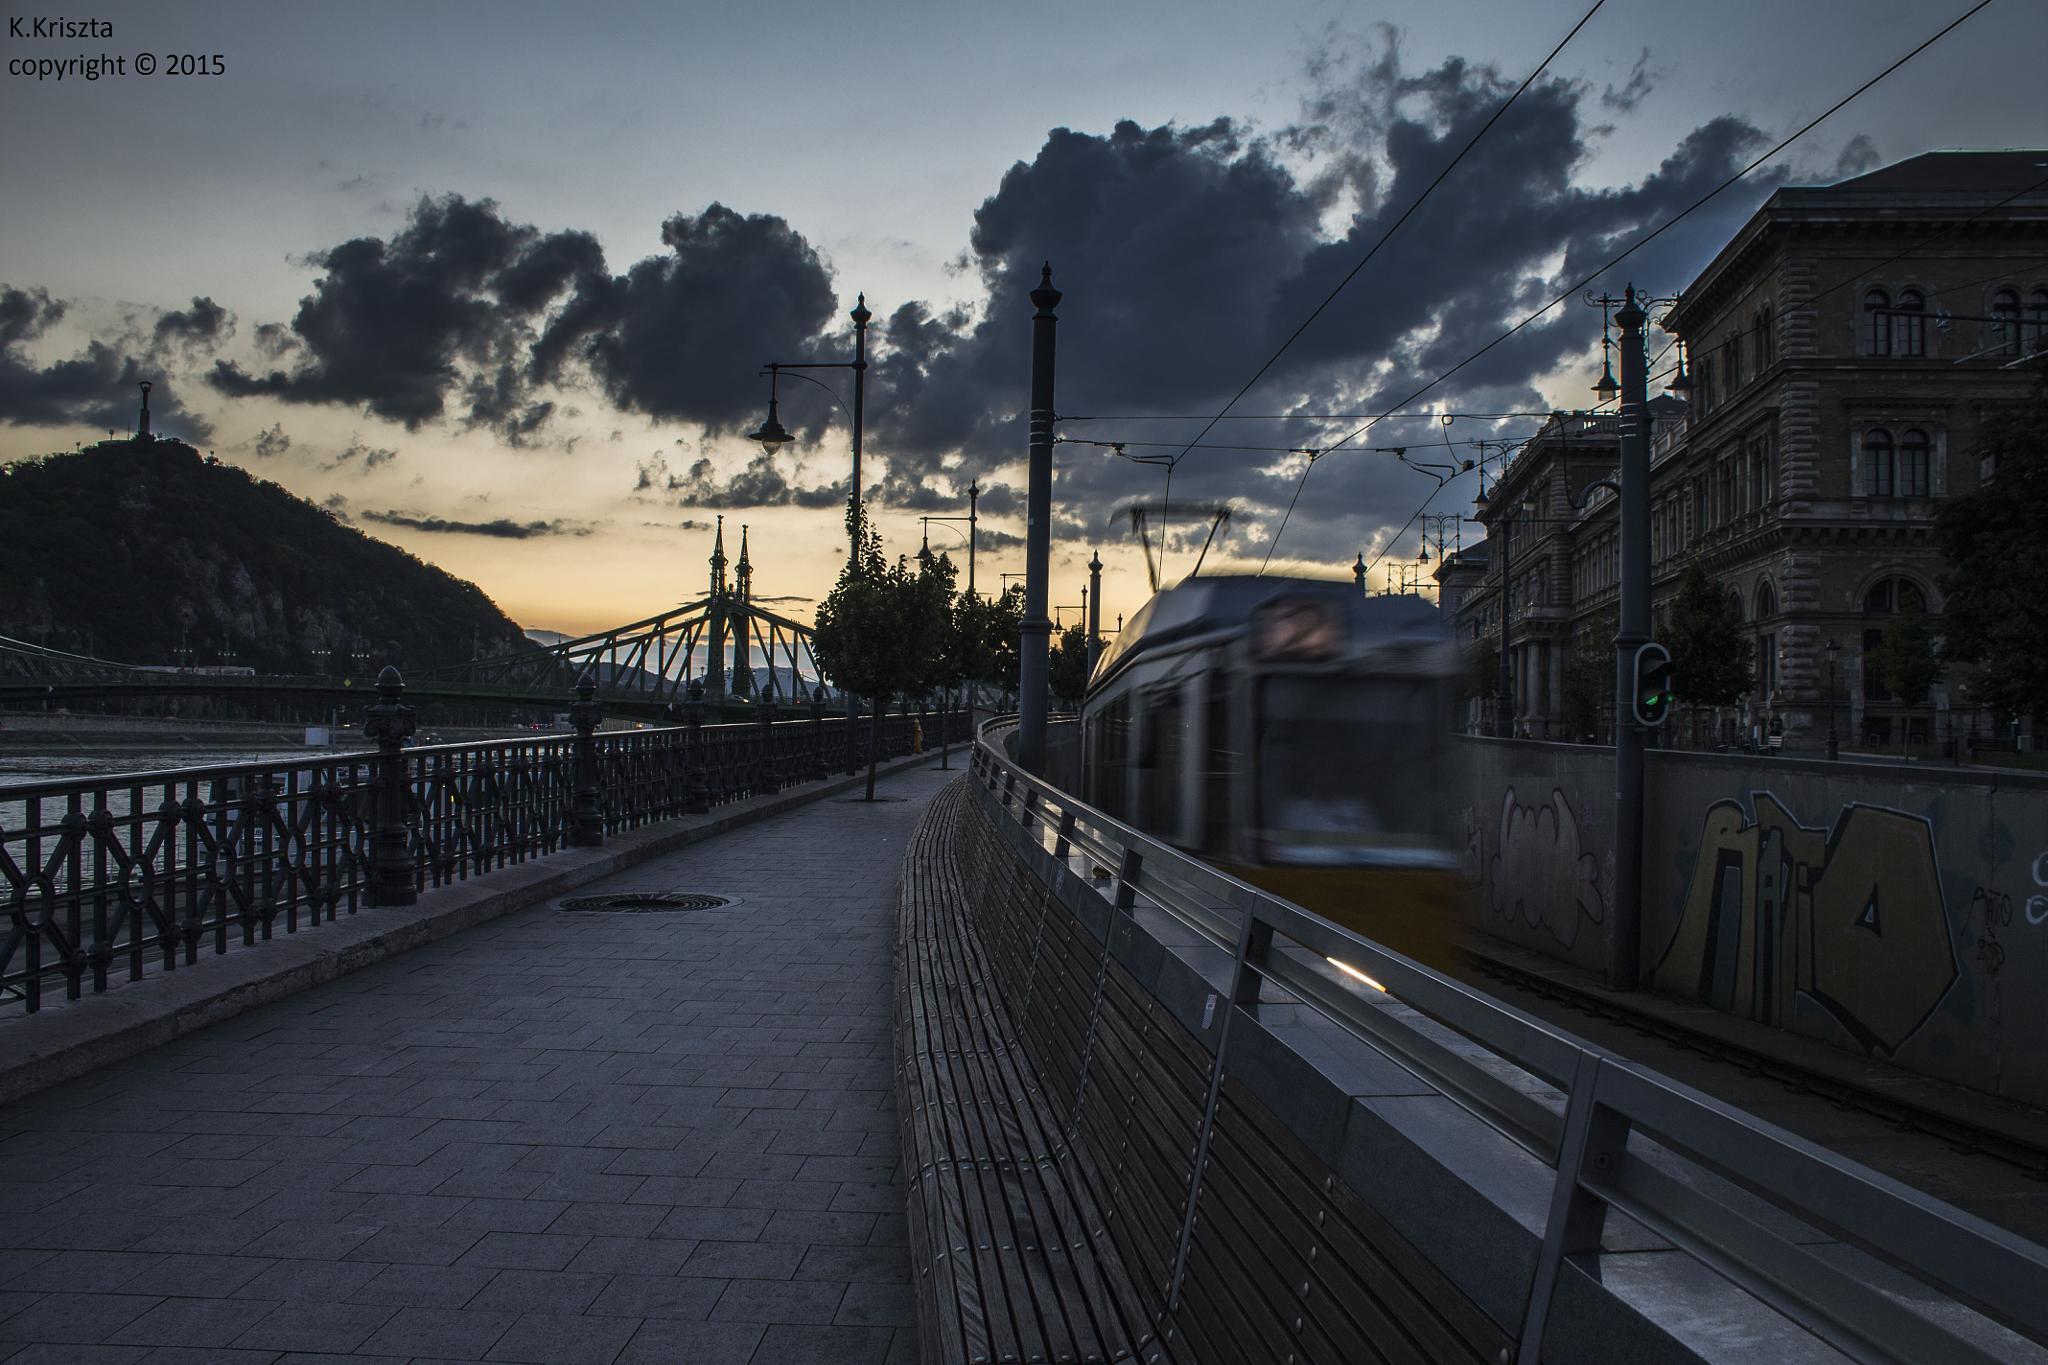 When the sun goes down by Koczka Kriszta